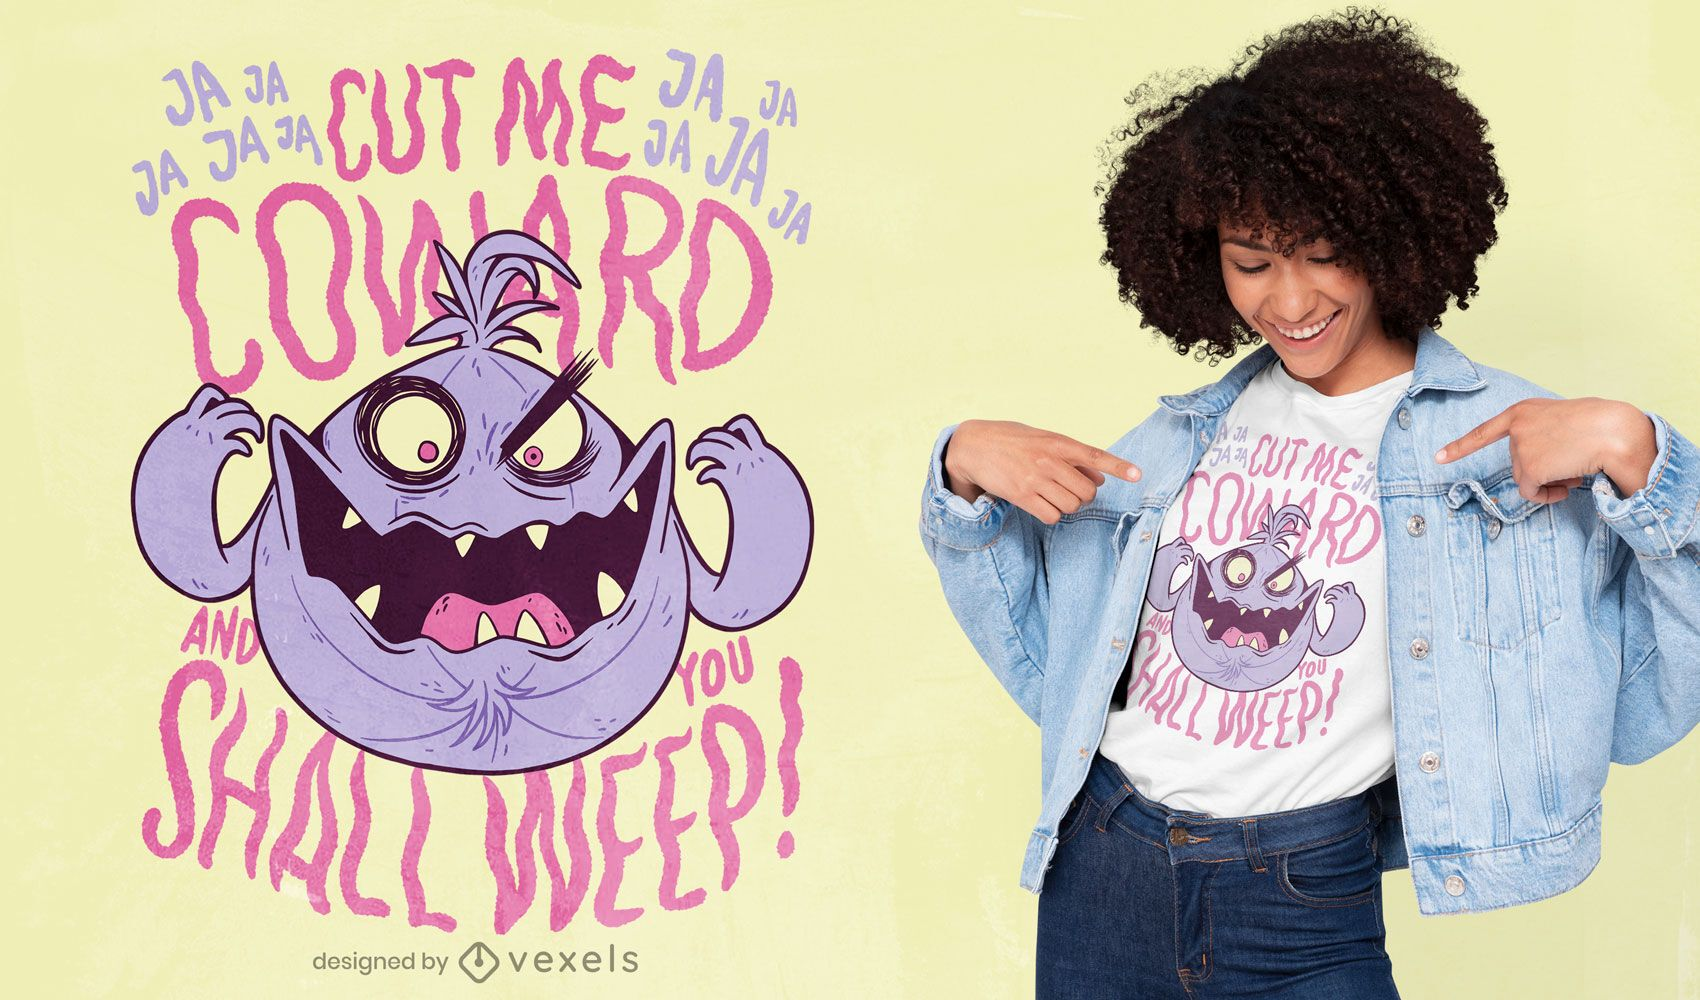 Evil onion quote cartoon t-shirt design